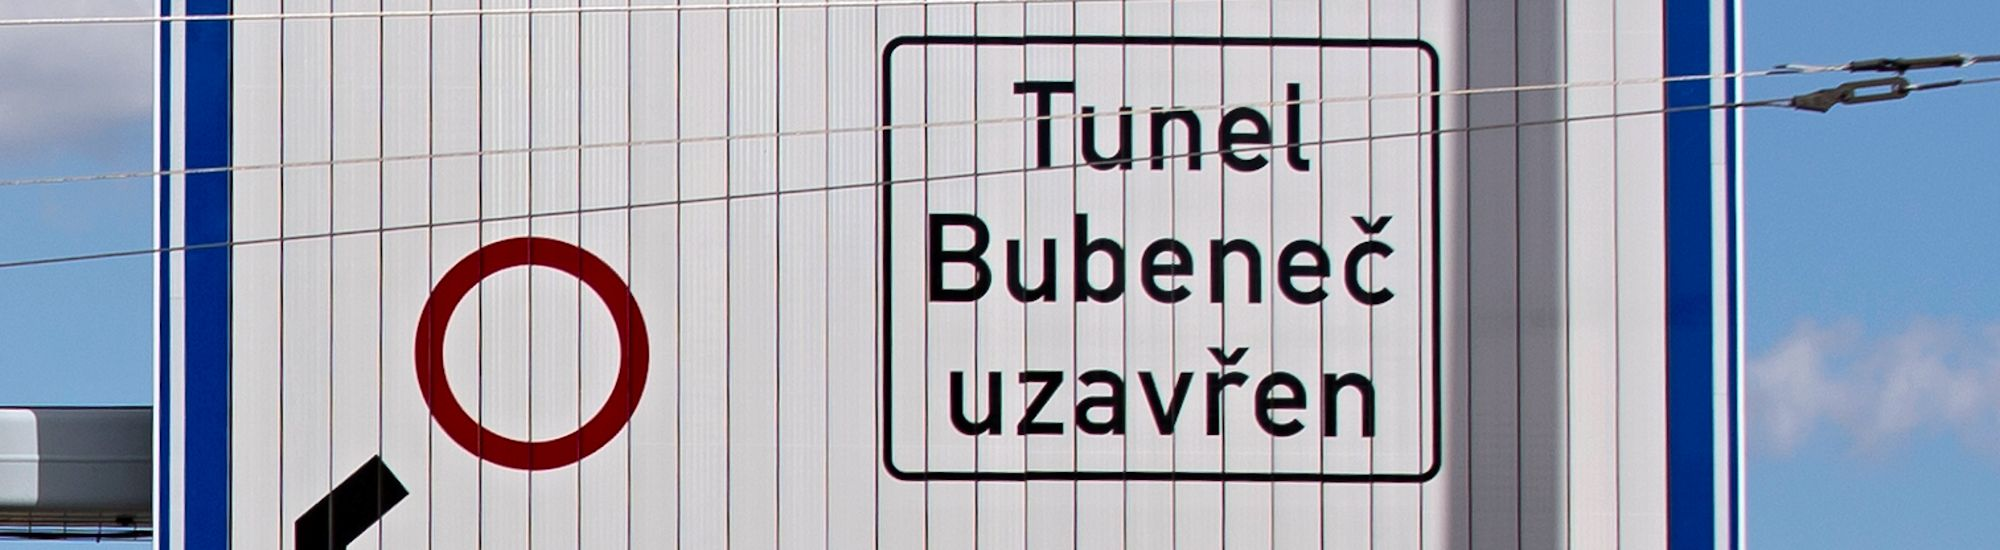 Uzávěra Bubenečského tunelu 14.10.-15.10.2017